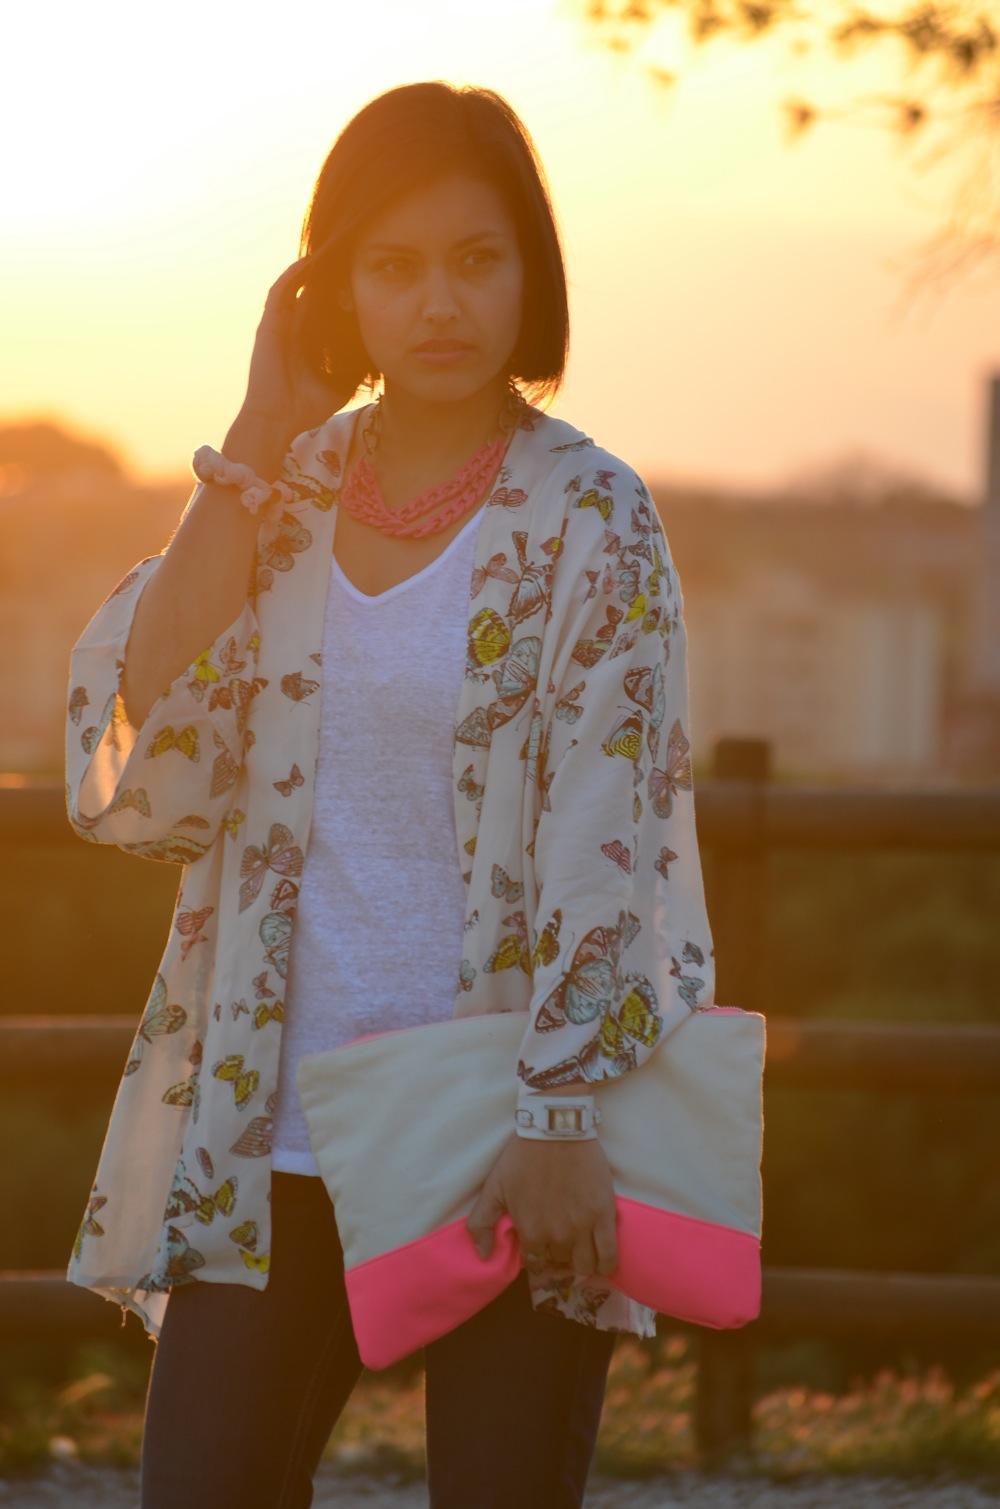 http://www.muacarmen.com/2015/04/blog-muacarmen-look-kimono-mariposas.html